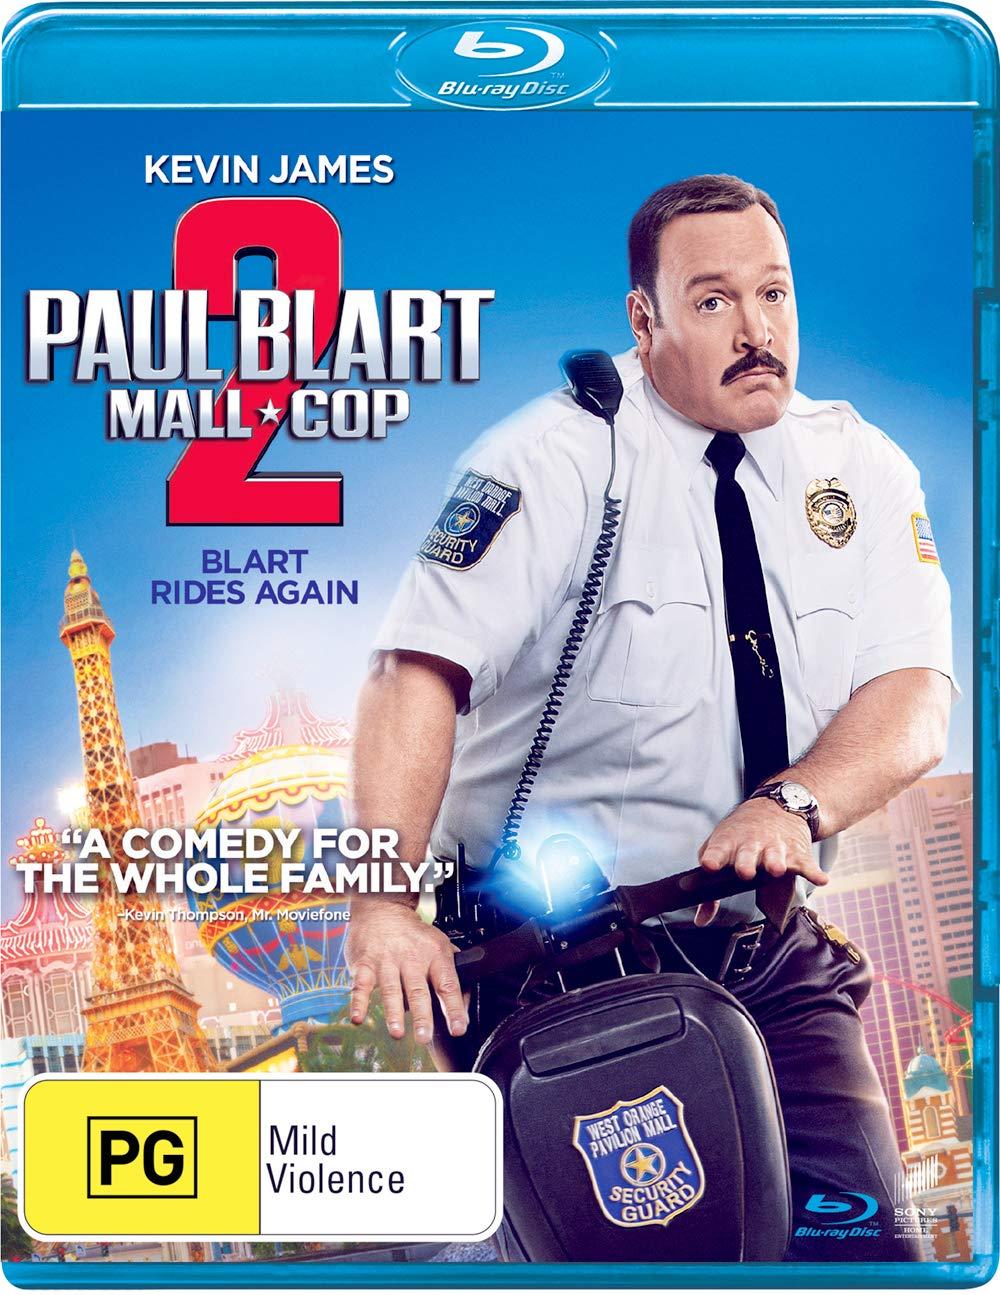 watch paul blart mall cop online free no download